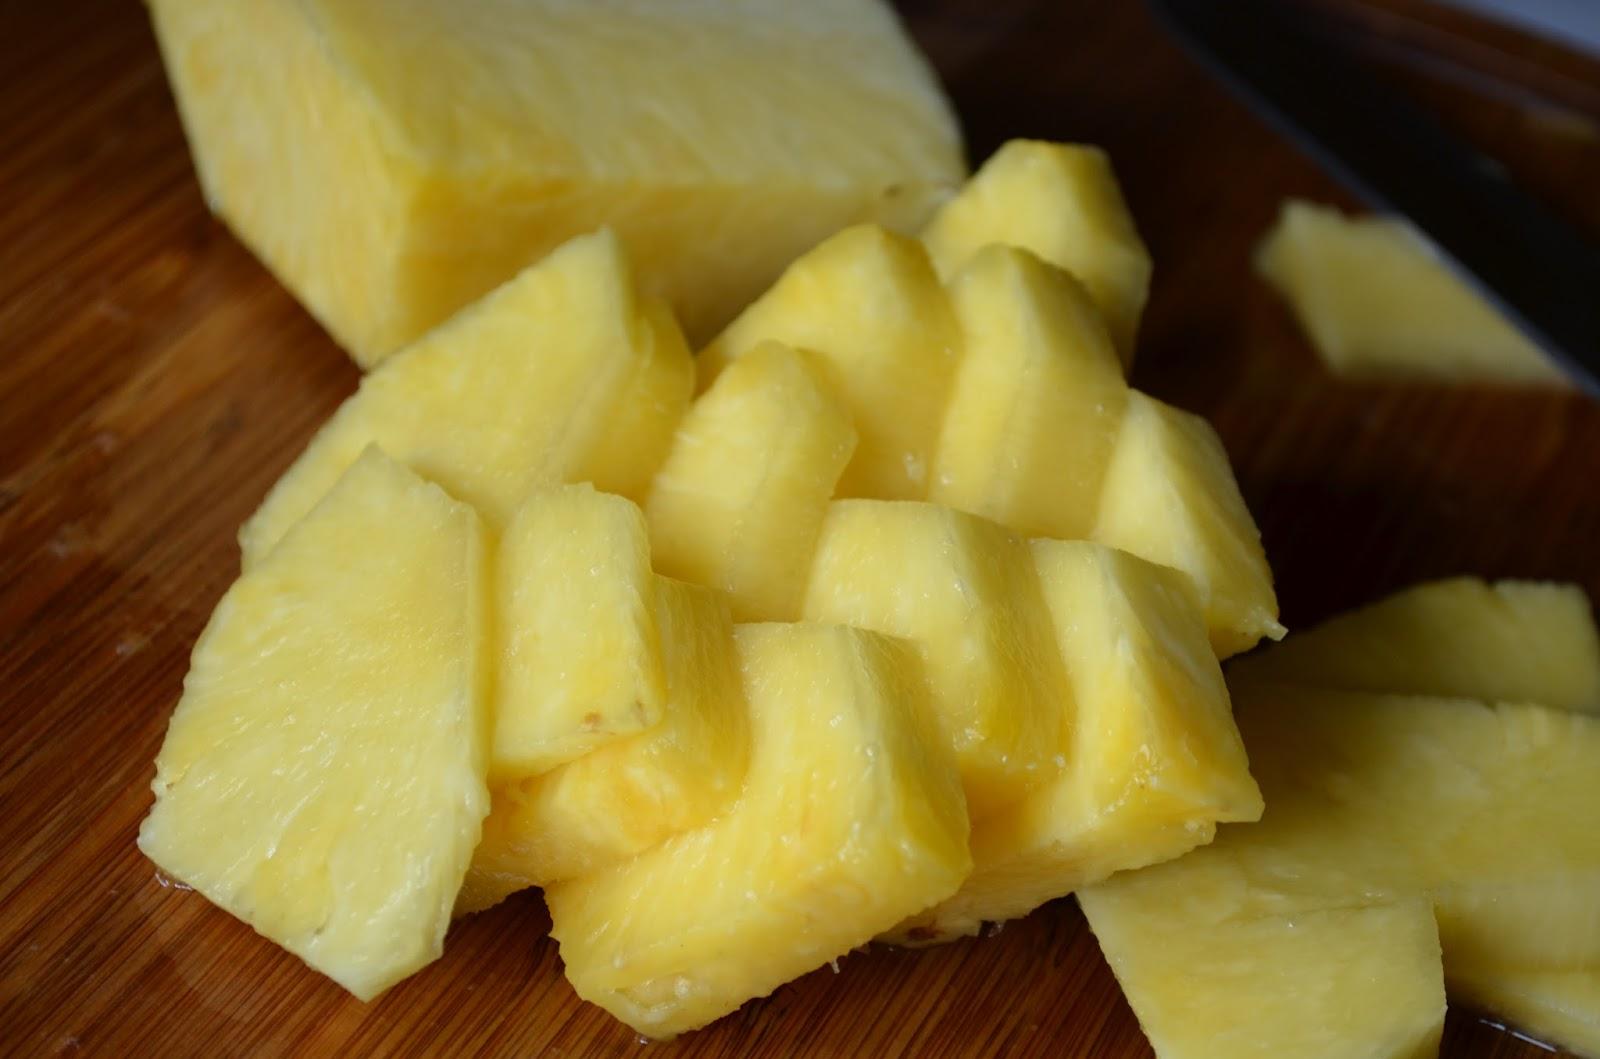 Fresh-Pineapple-Upside-Down-Cake-From-Scratch-Slice.jpg